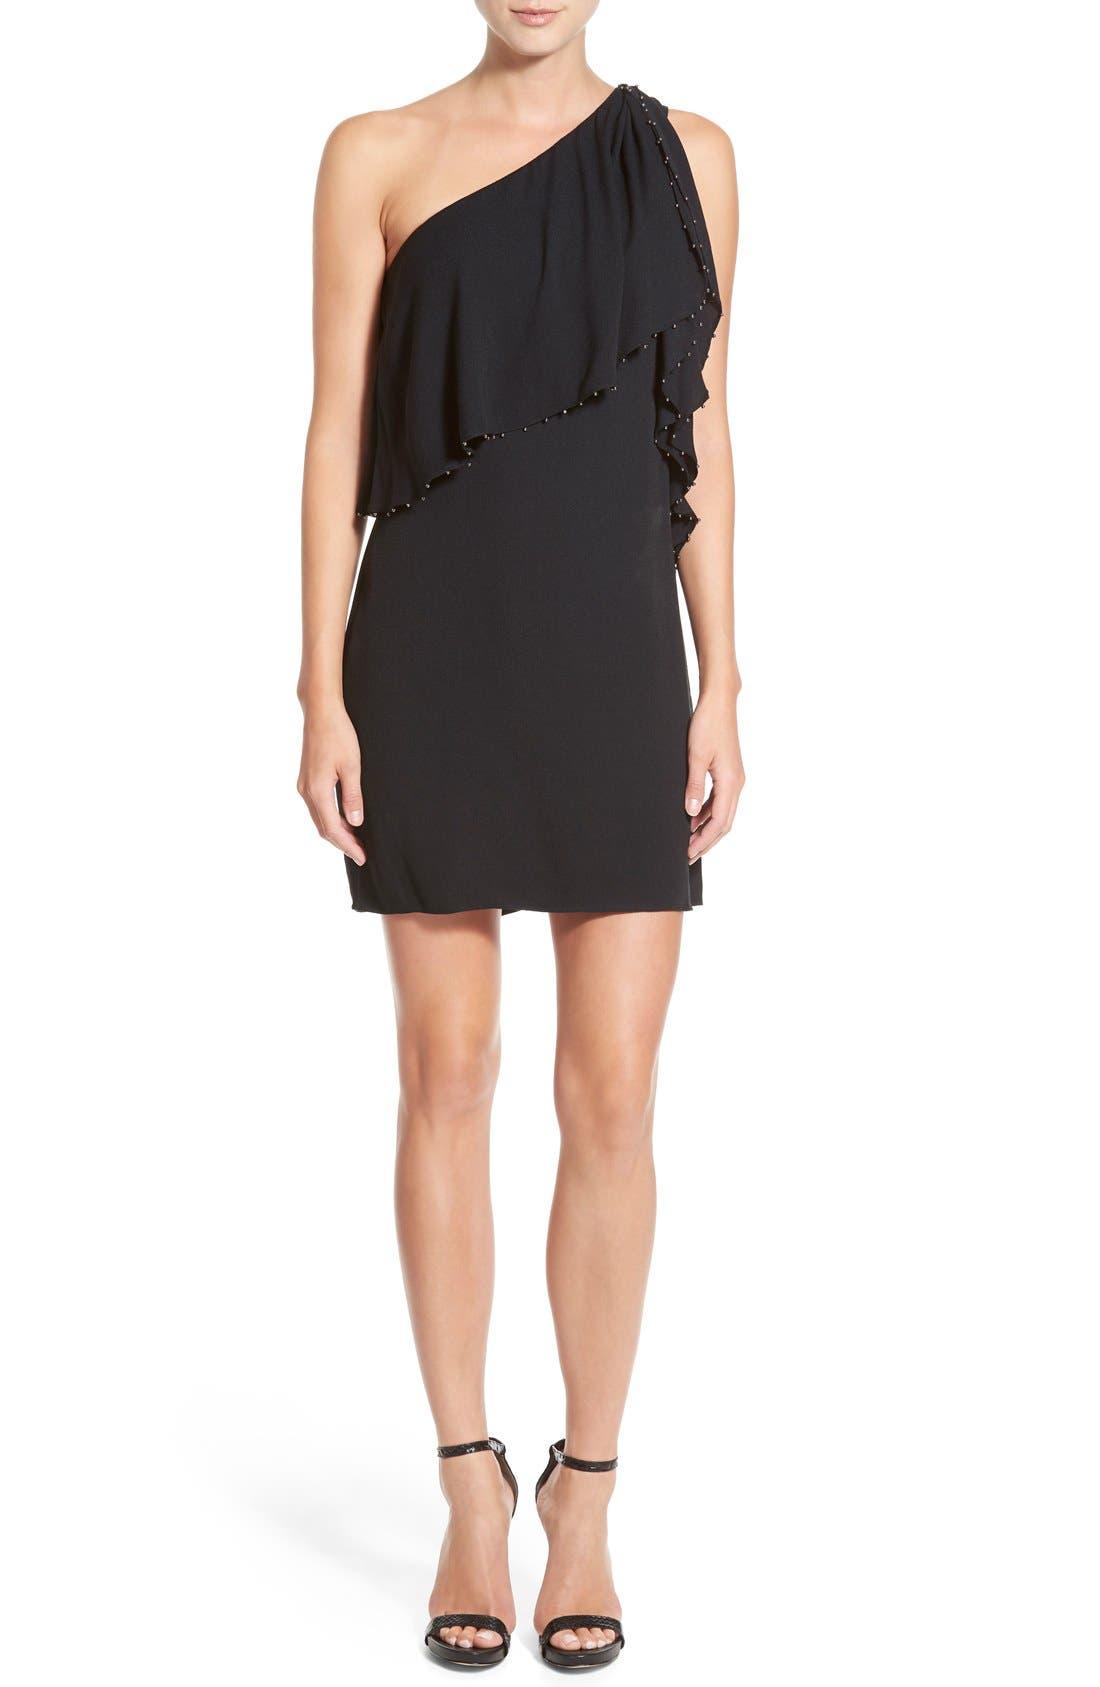 Main Image - Ella Moss 'Stella' One Shoulder Crepe Dress